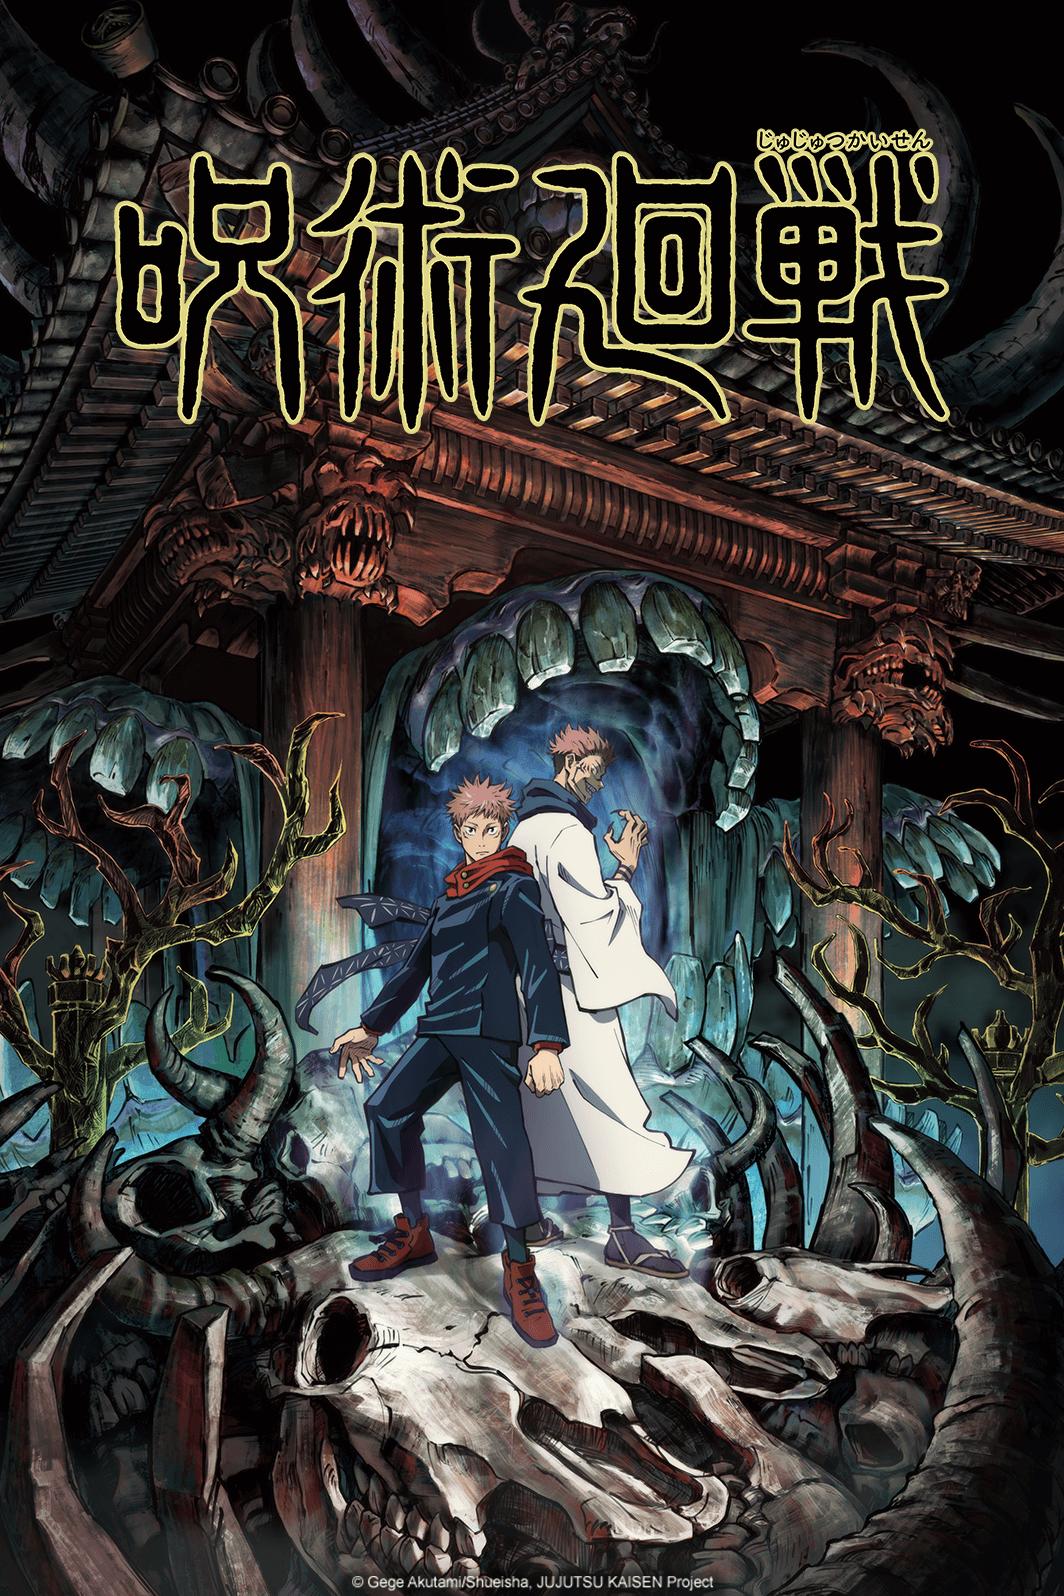 El Anime Jujutsu Kaisen Llegara El Proximo Octubre A Crunchyroll Jujutsu Anime Printables Manga Covers